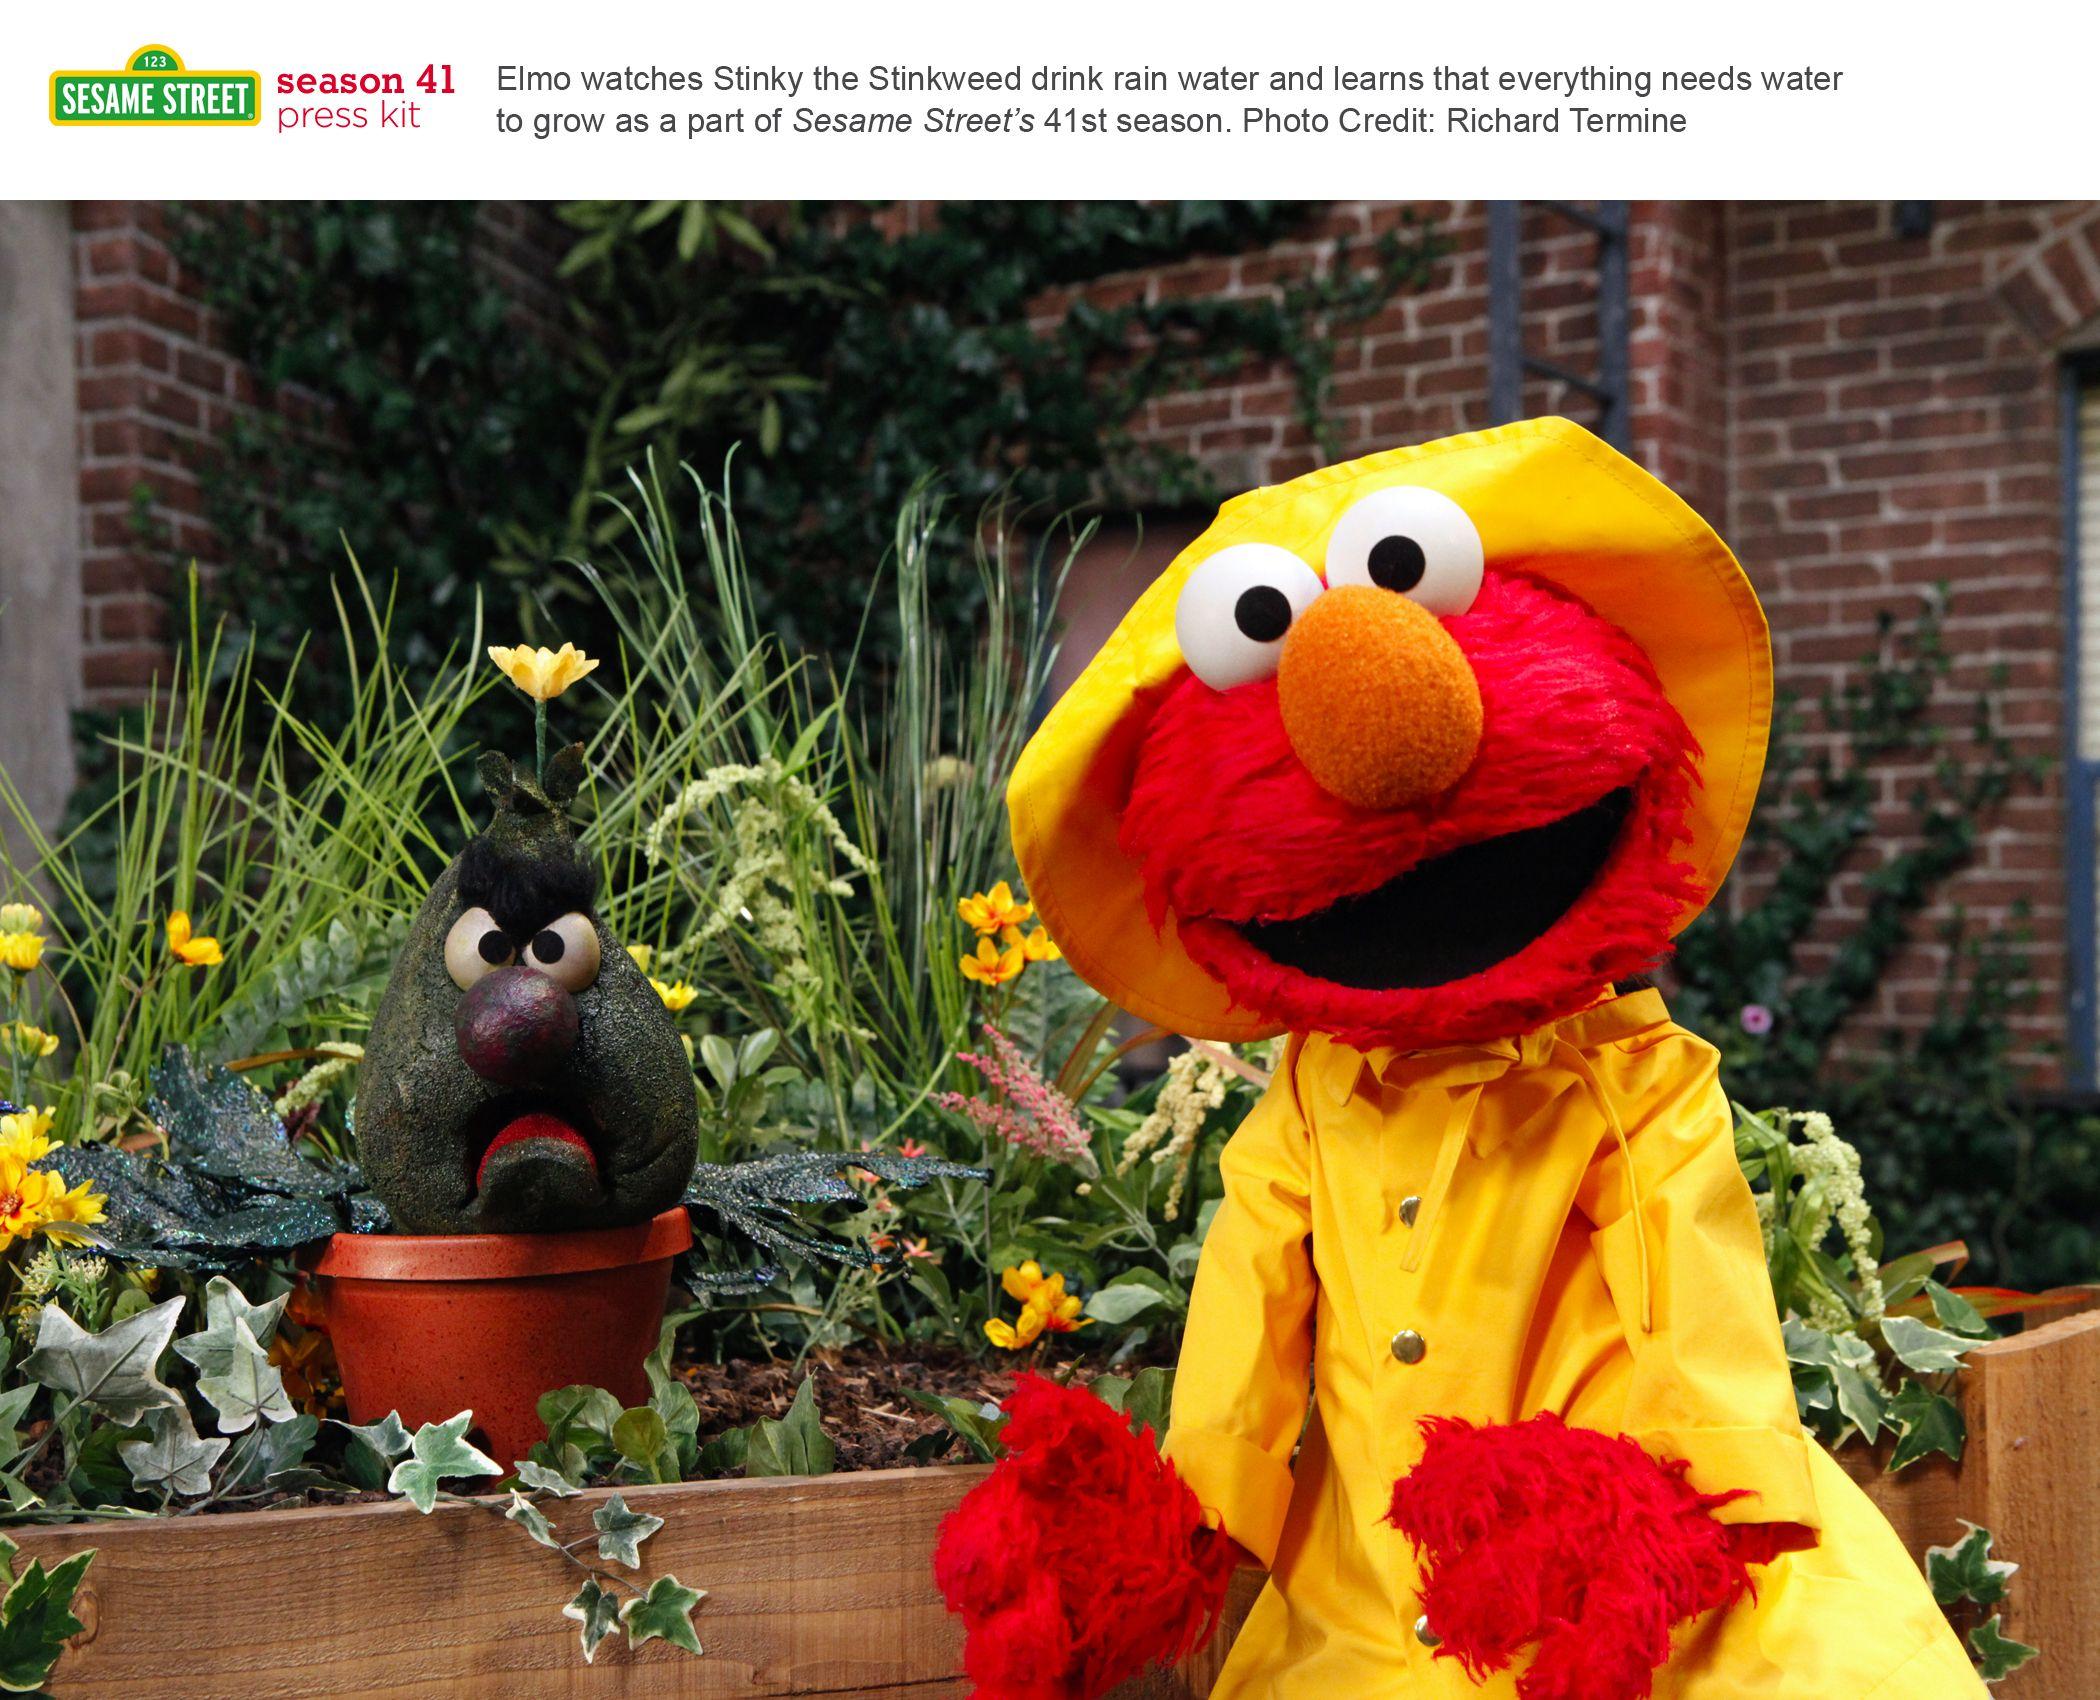 Elmo and Stinky the plant  | Sesame Street kids character shirts